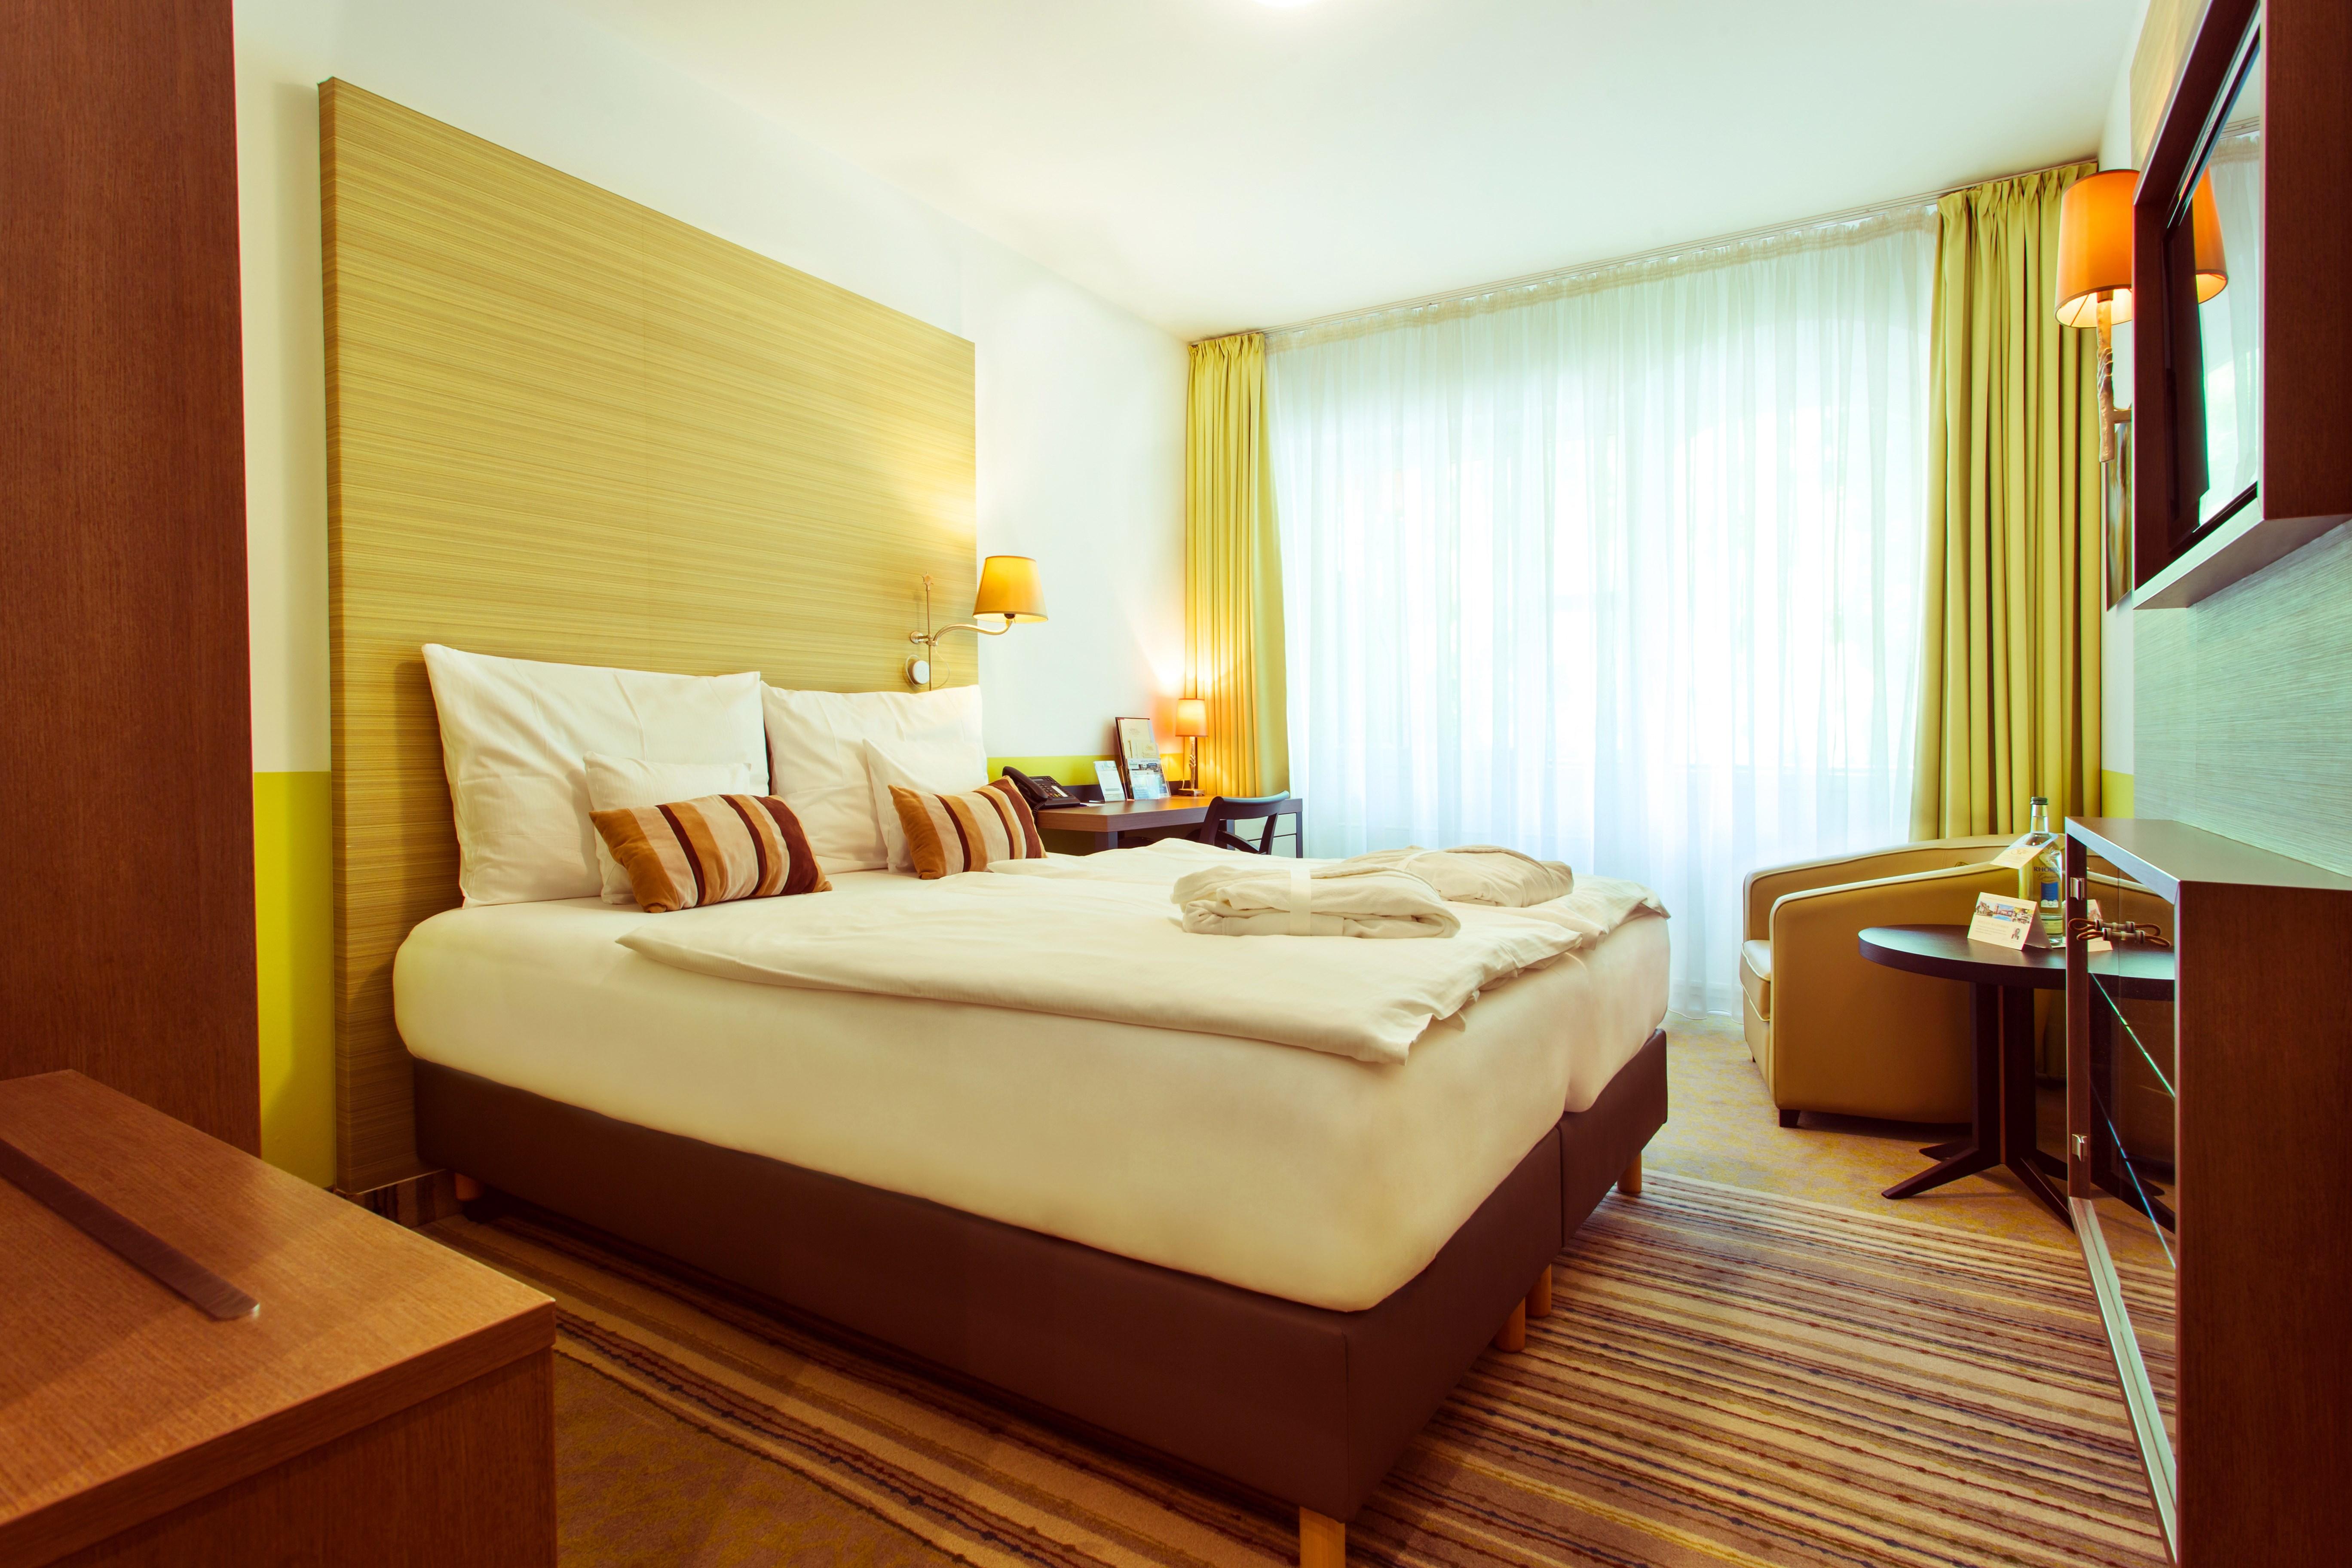 Göbel´s Vital Hotel Bad Sachsa - Komfort Doppelzimmer